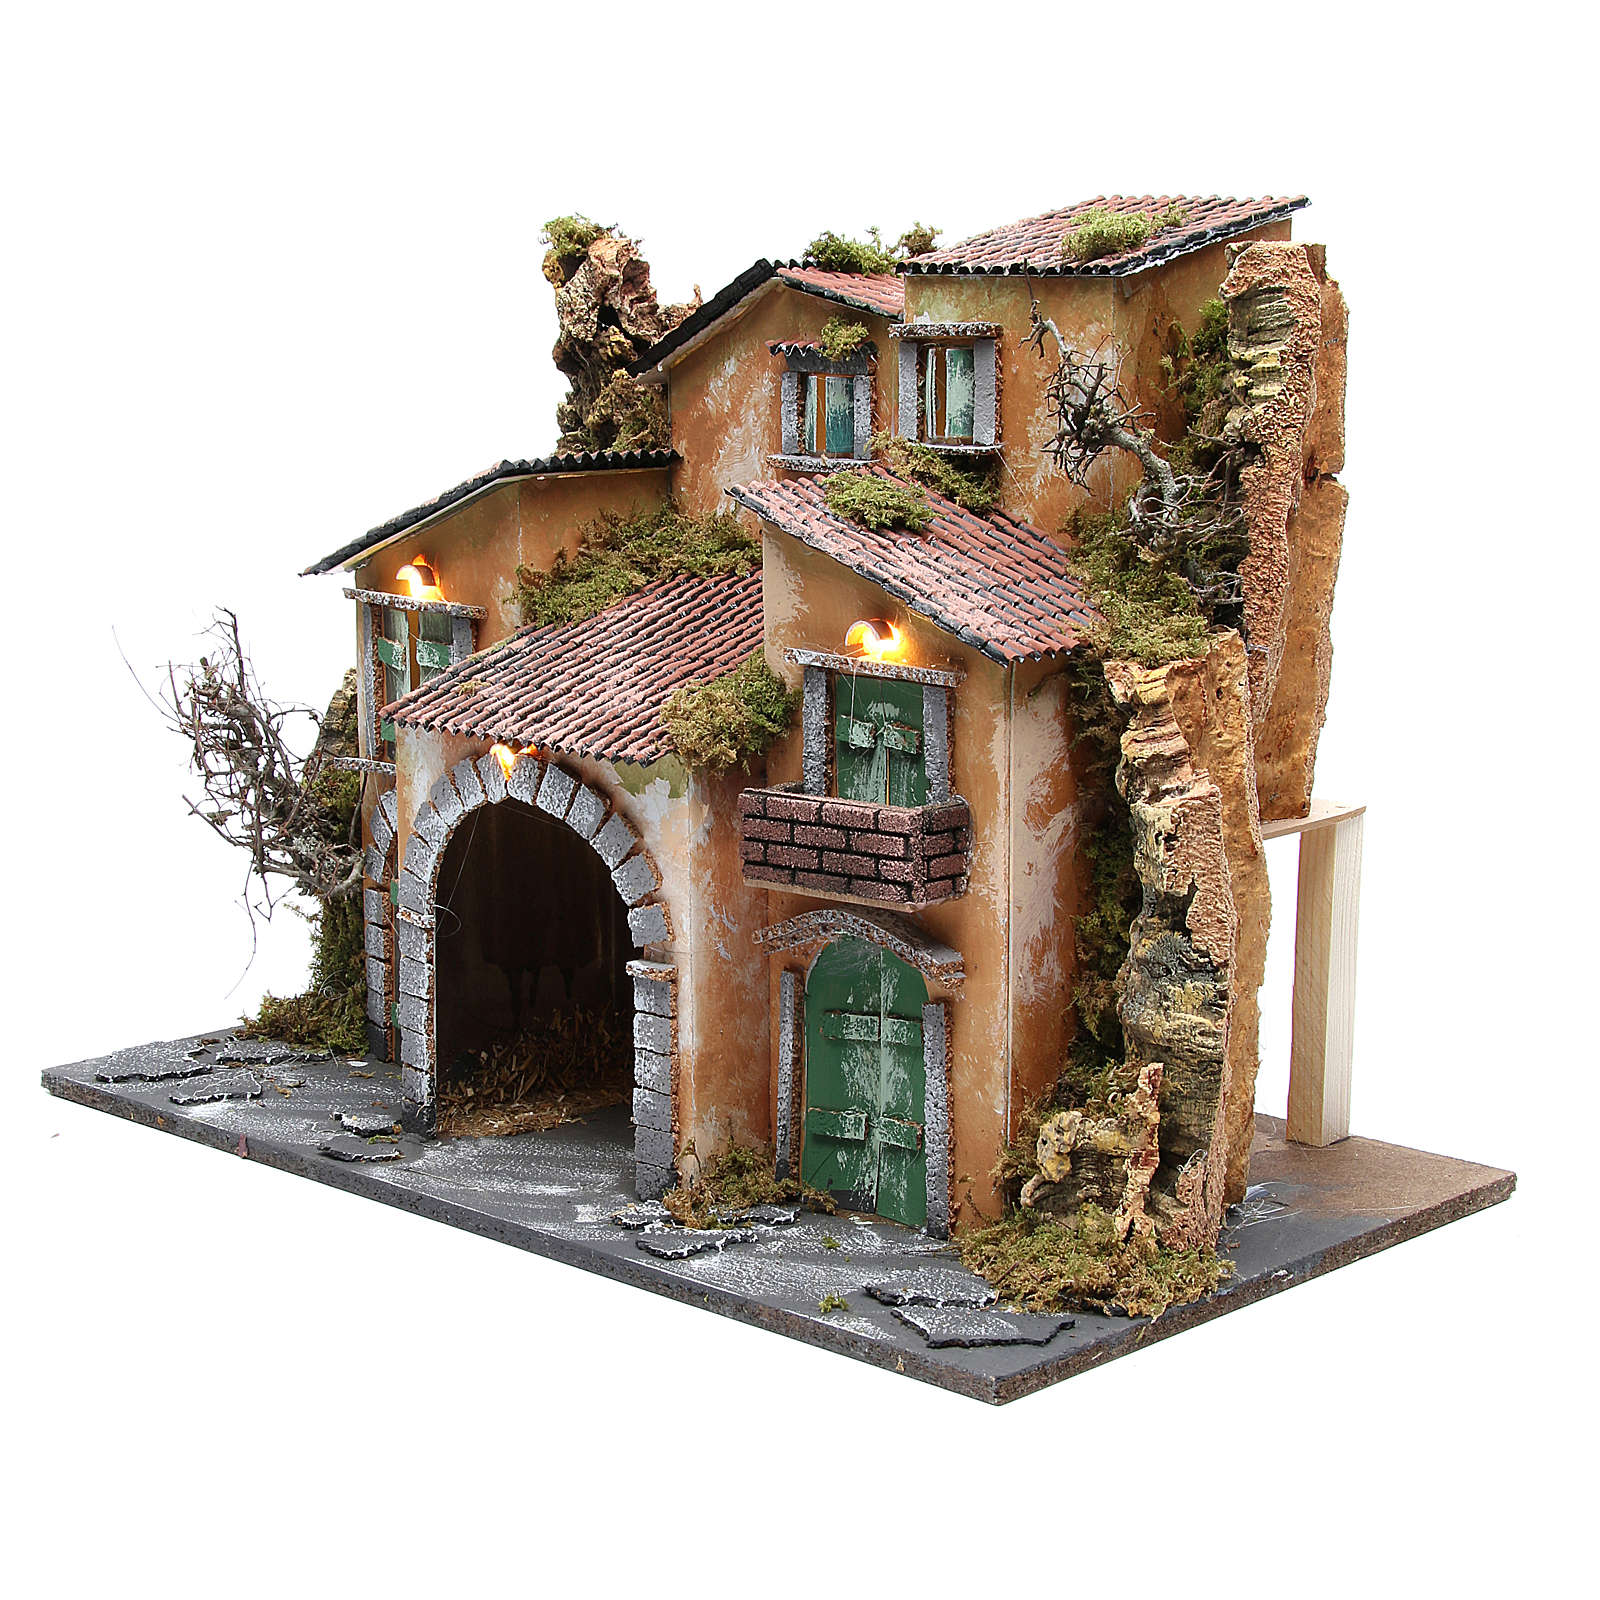 Borgo con capanna 43x60x34 cm con 10 luci a batteria 4